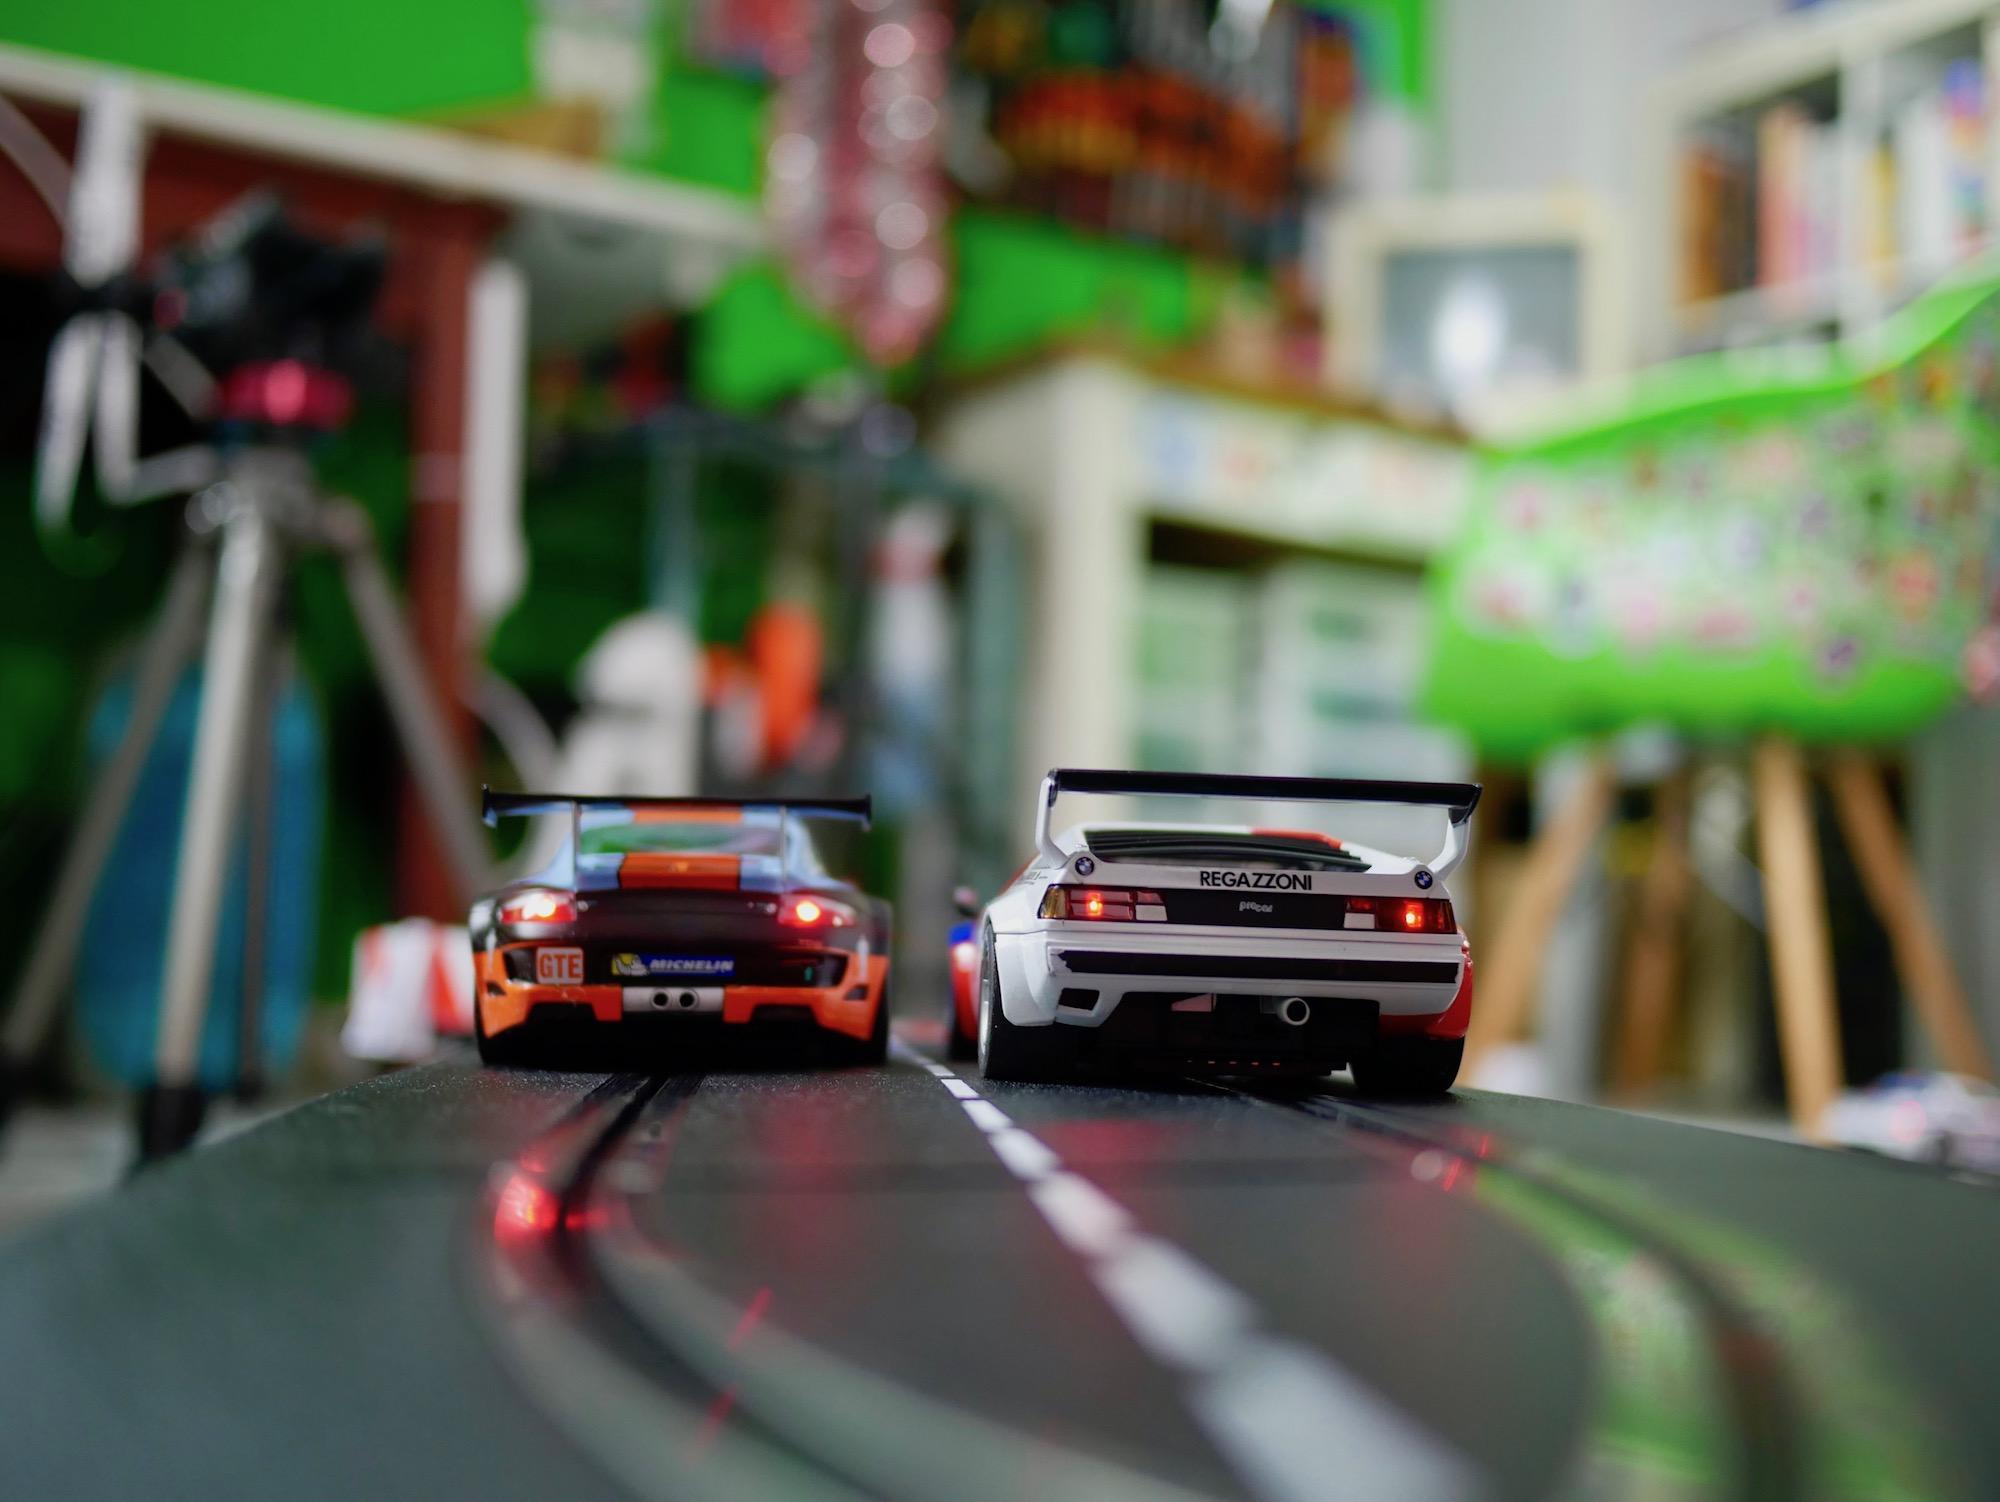 Carrera Digital 124 Slot Cars - Race of Victory Unboxing Italiano